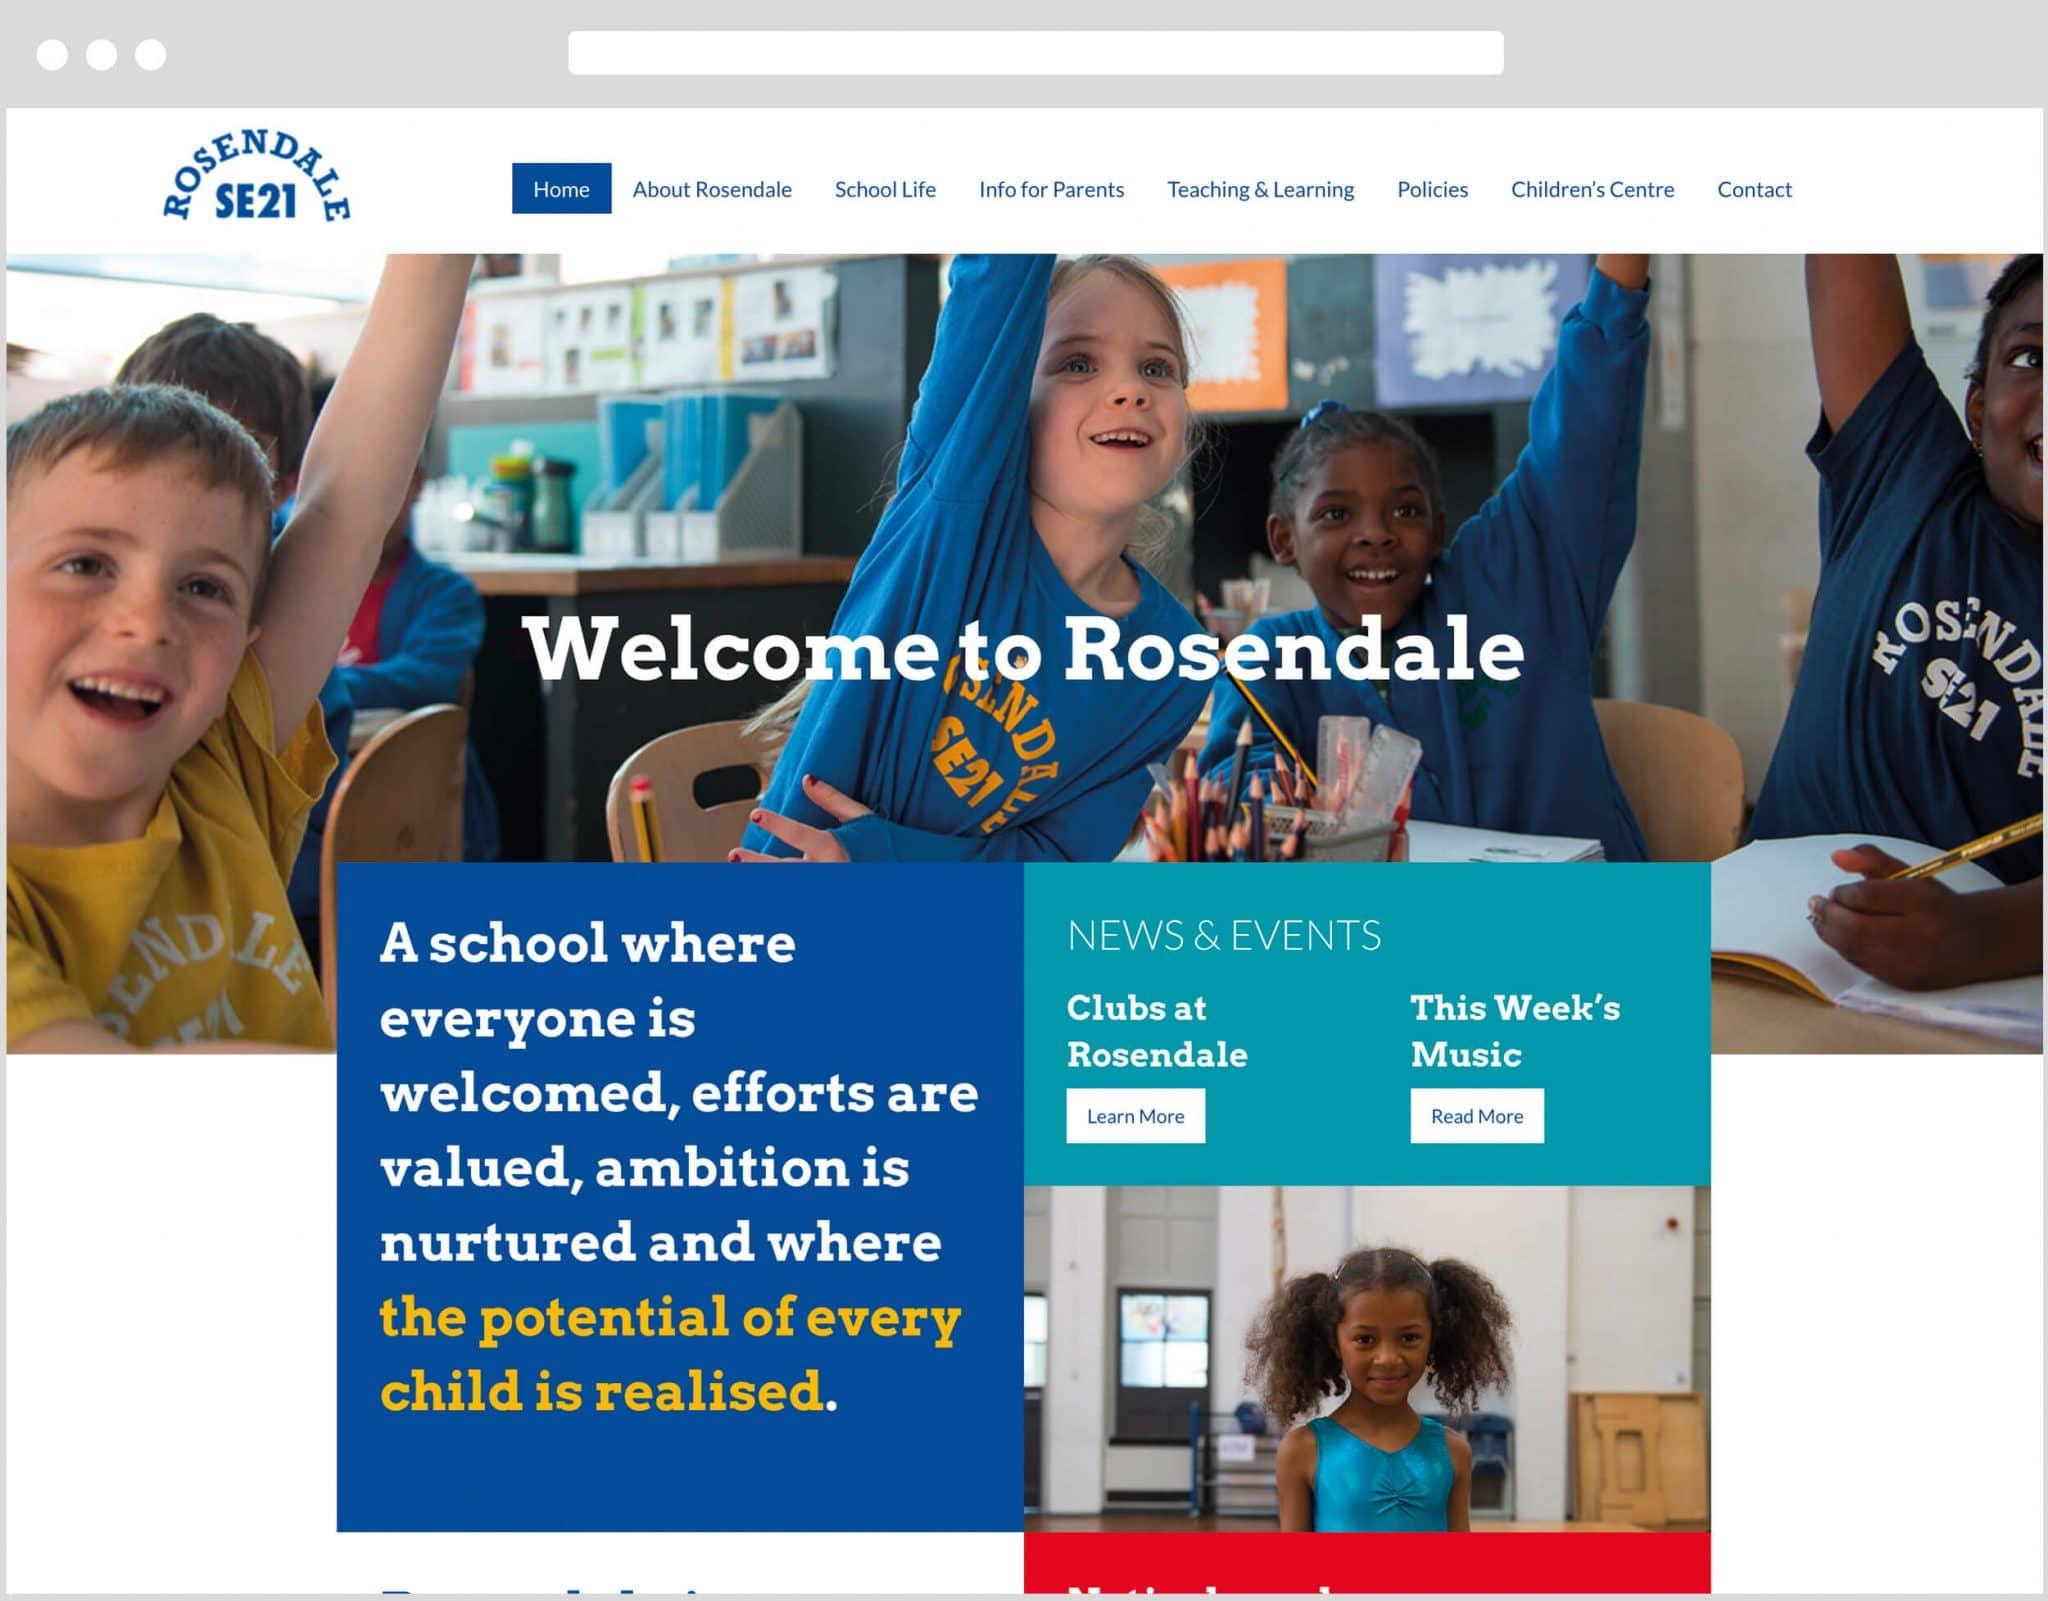 Web Design Bedfordshire - Rosendale Primary School Website Build